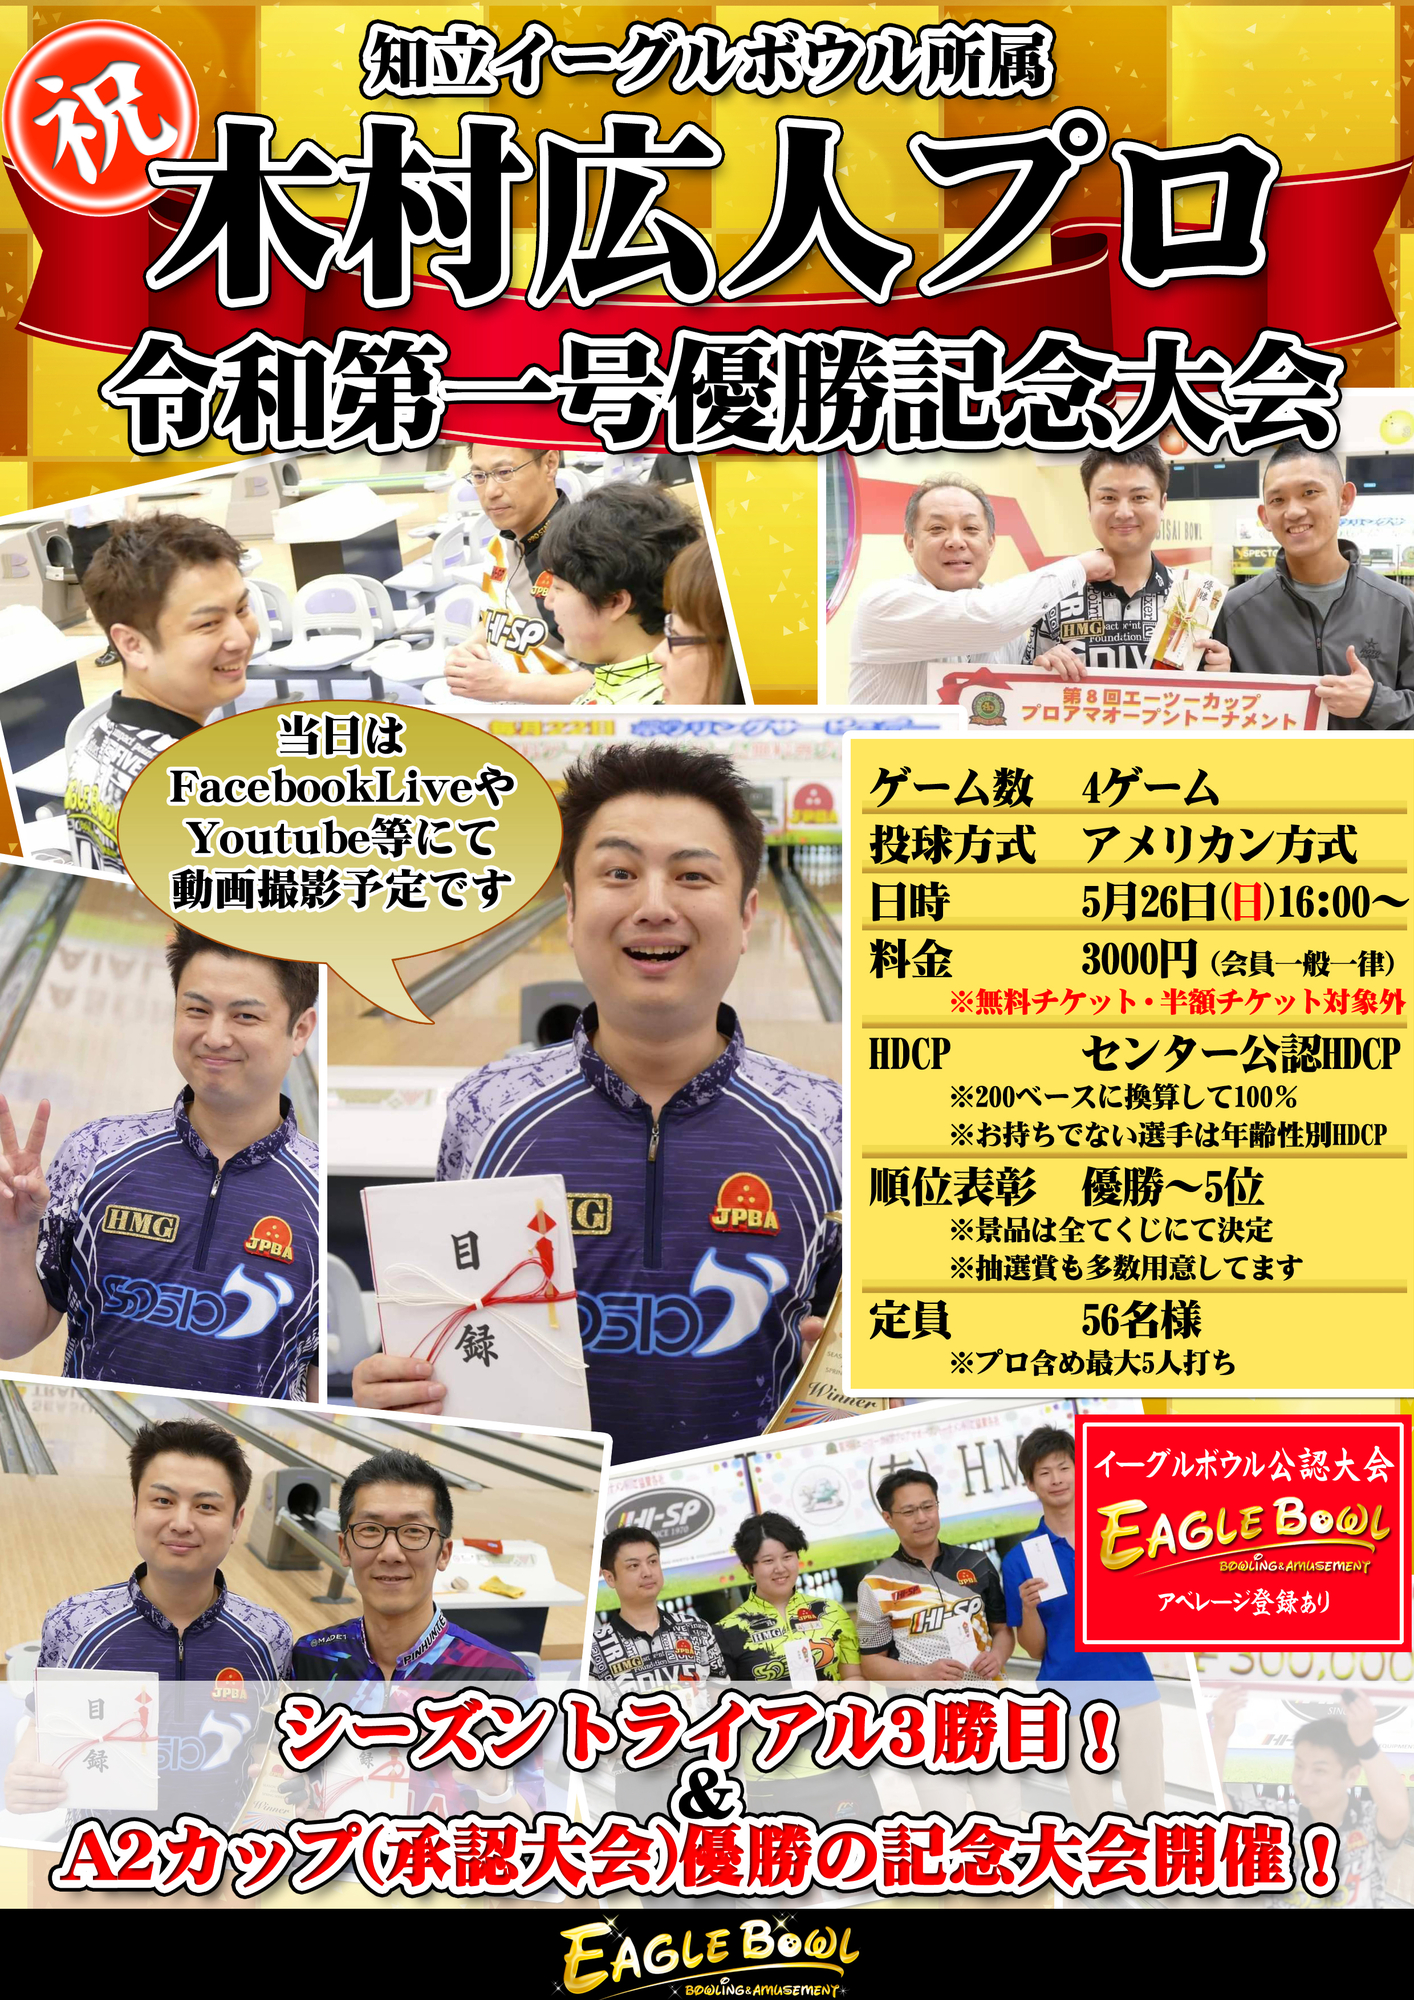 5/26 木村プロ優勝記念大会